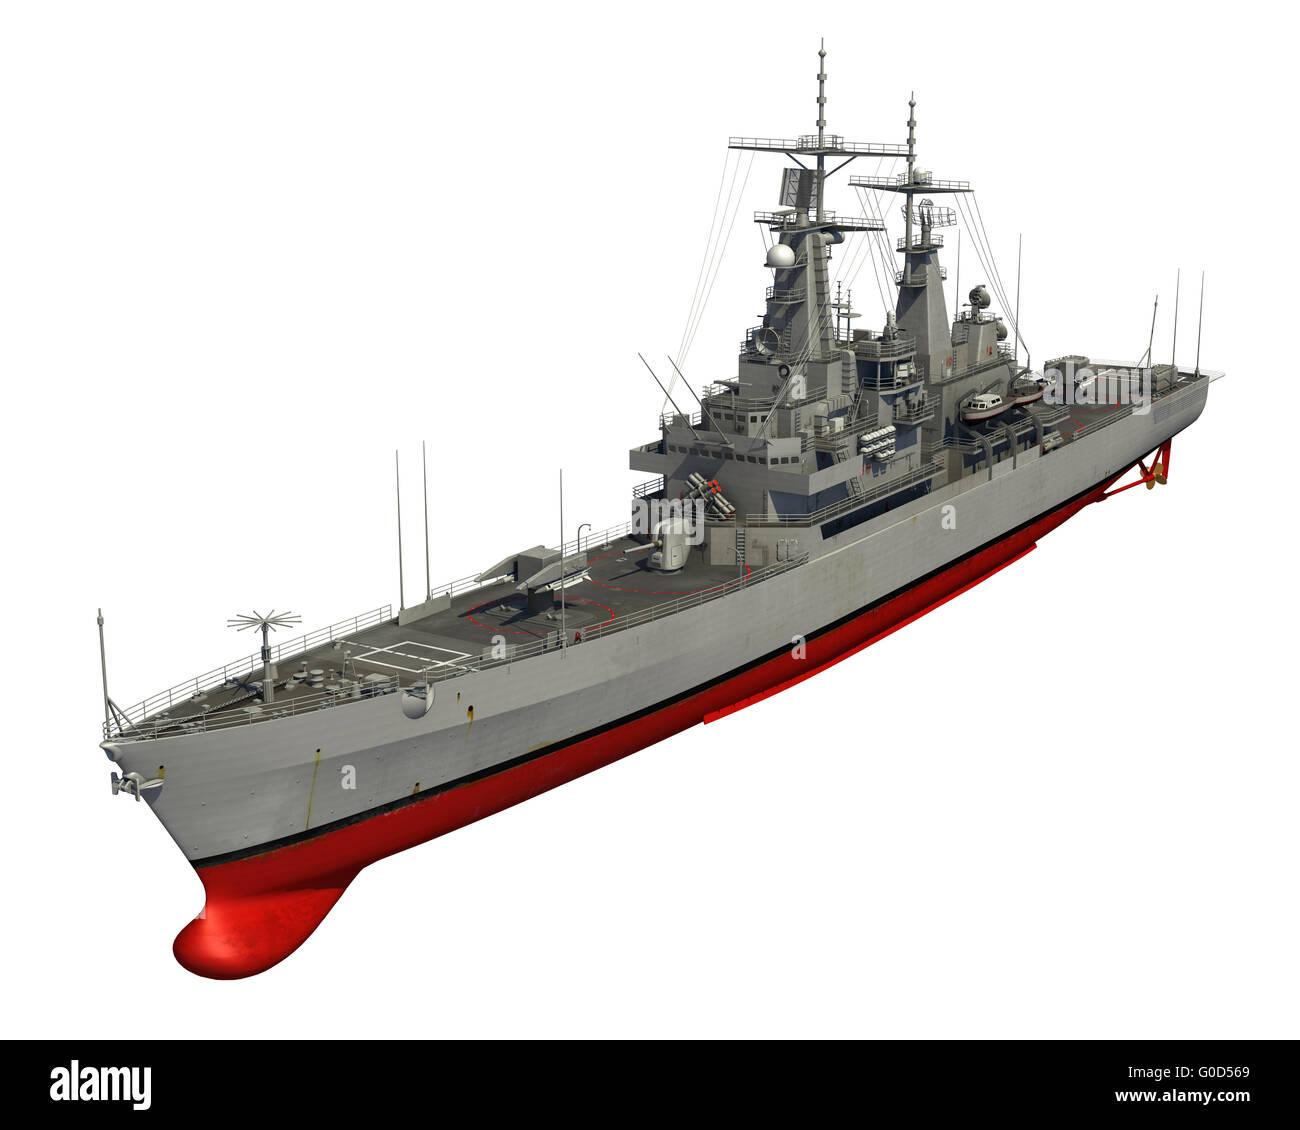 American Modern Warship On White Background. 3D Illustration. - Stock Image